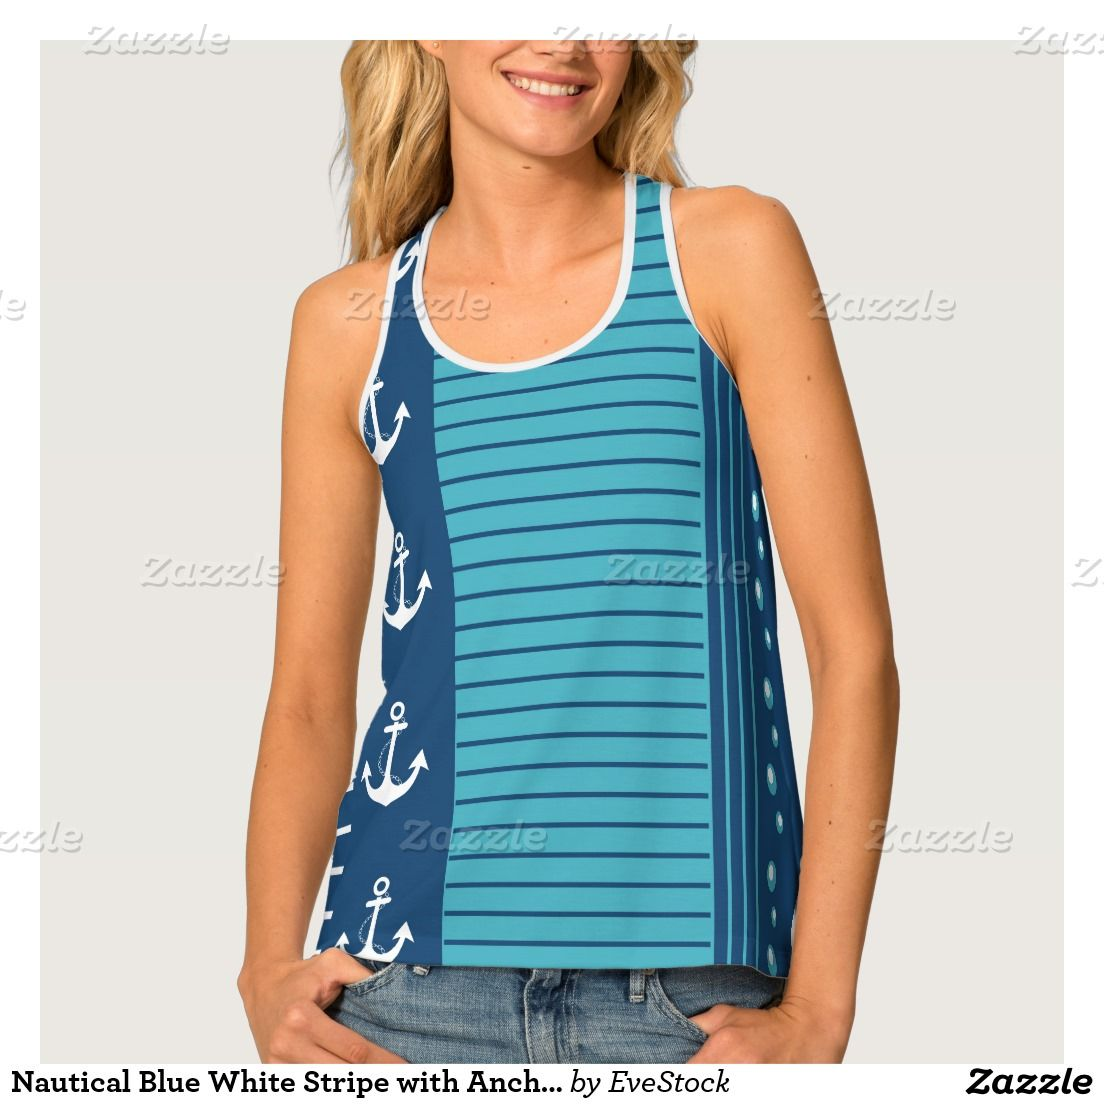 Nautical Blue White Stripe with Anchor Tank Top